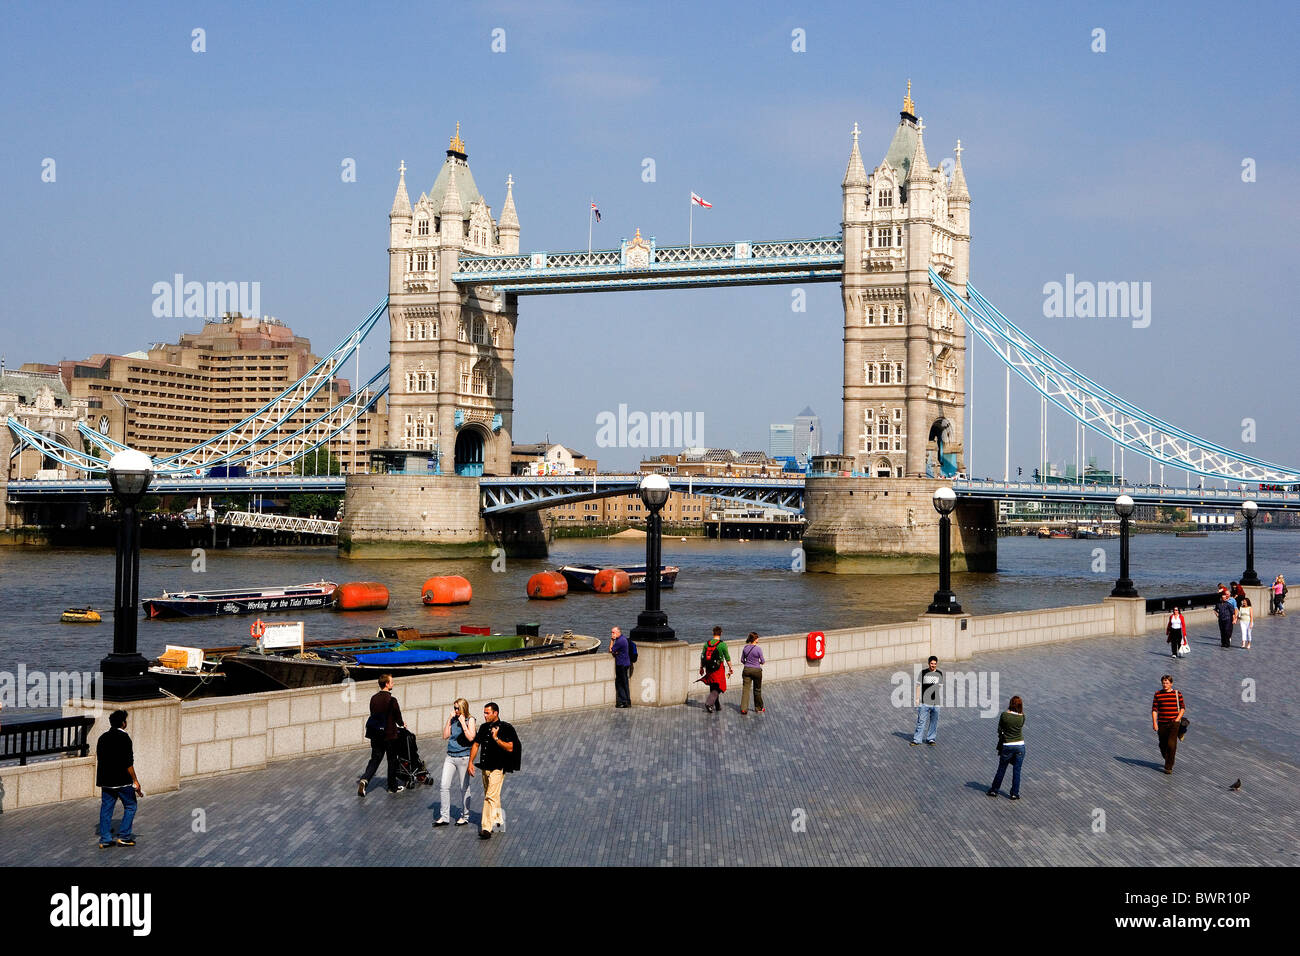 UK London City Tower Bridge Landmark Thames River Shore